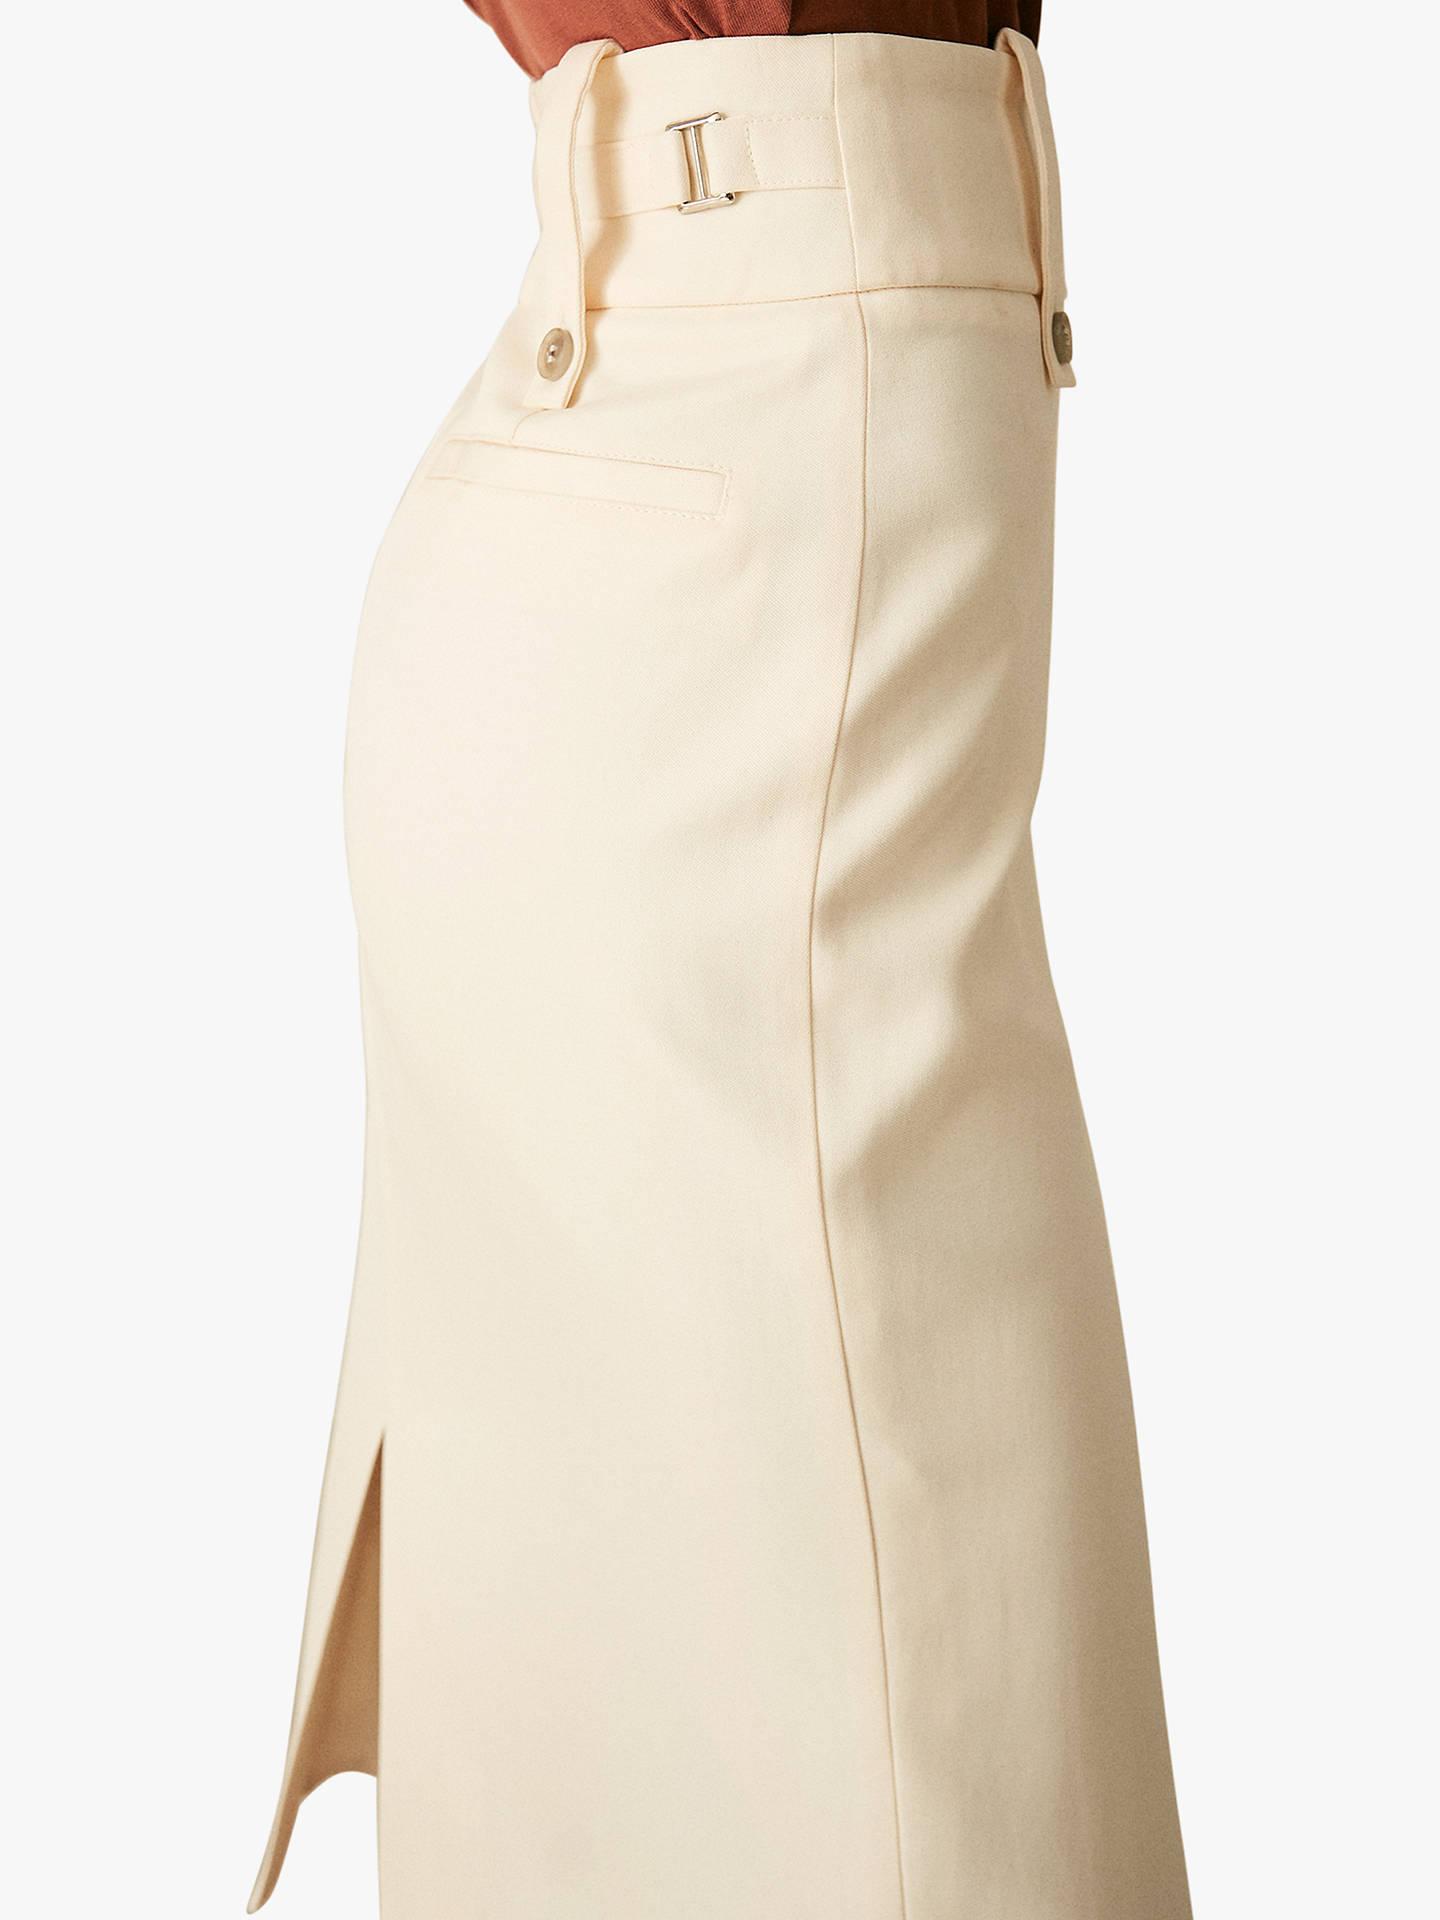 f02a5c1590 ... Buy Reiss Lennox Pencil Skirt, Off White, 6 Online at johnlewis.com